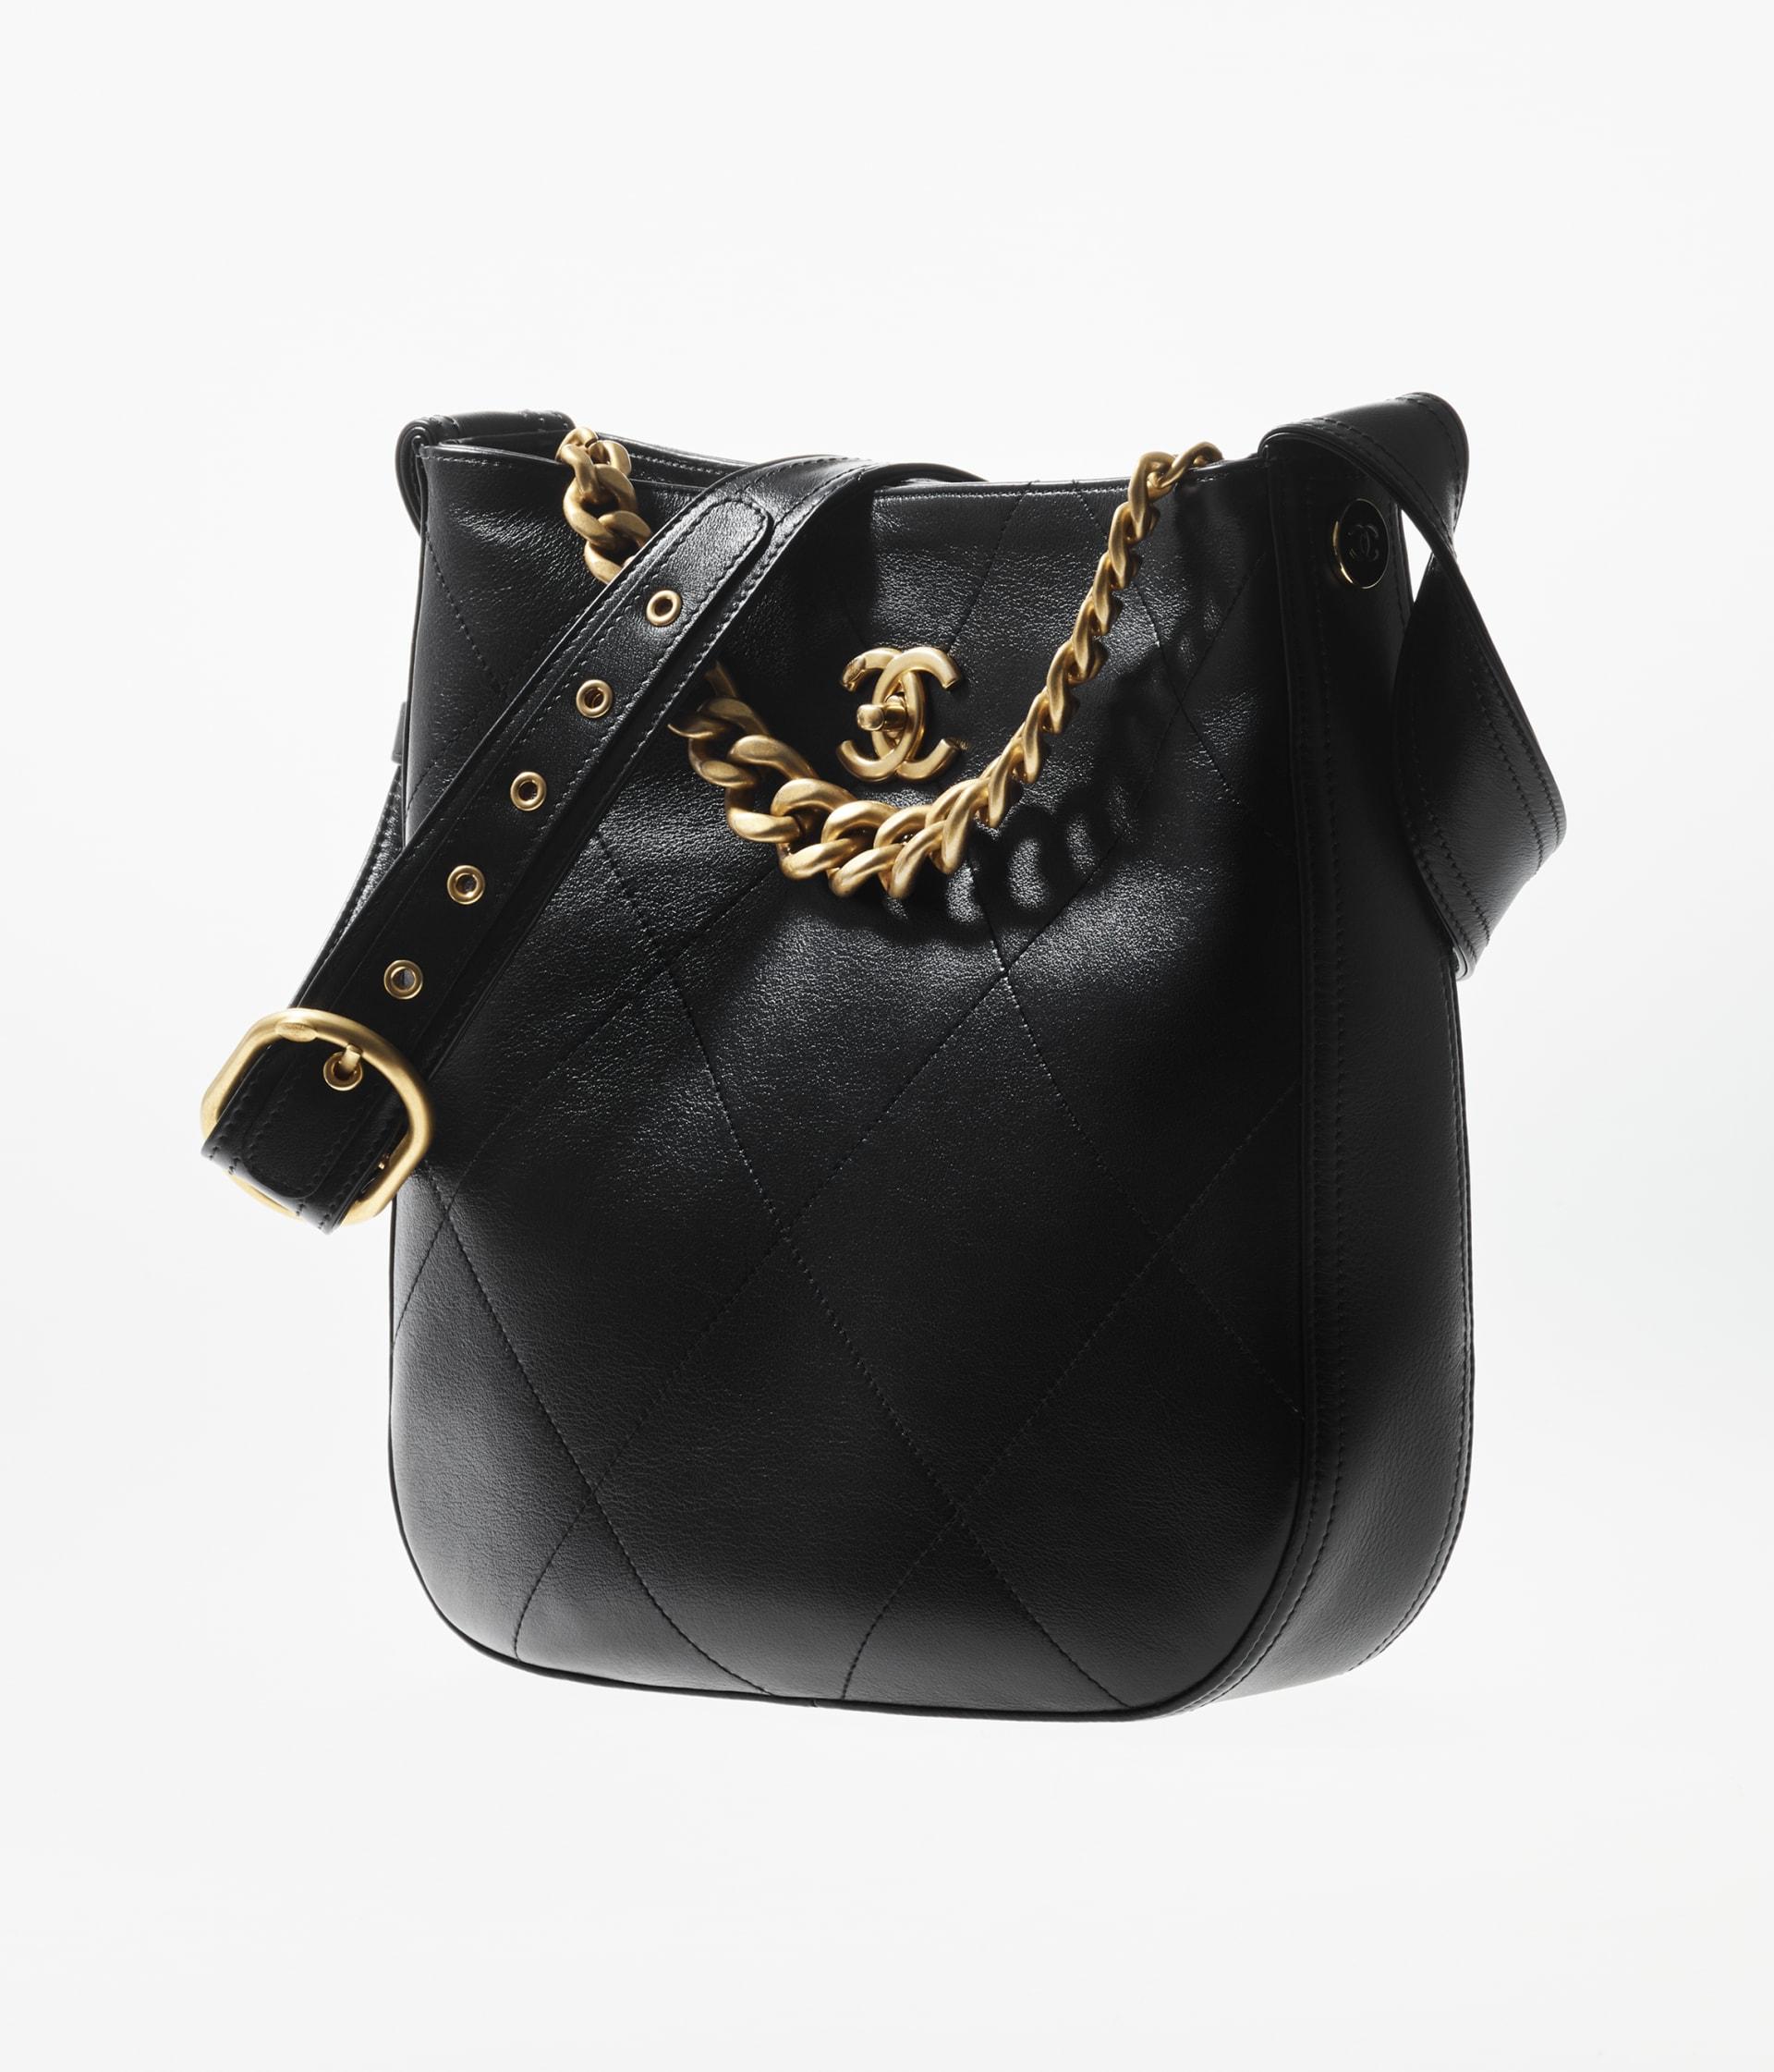 image 2 - Hobo Handbag - Calfskin & Gold-Tone Metal - Black